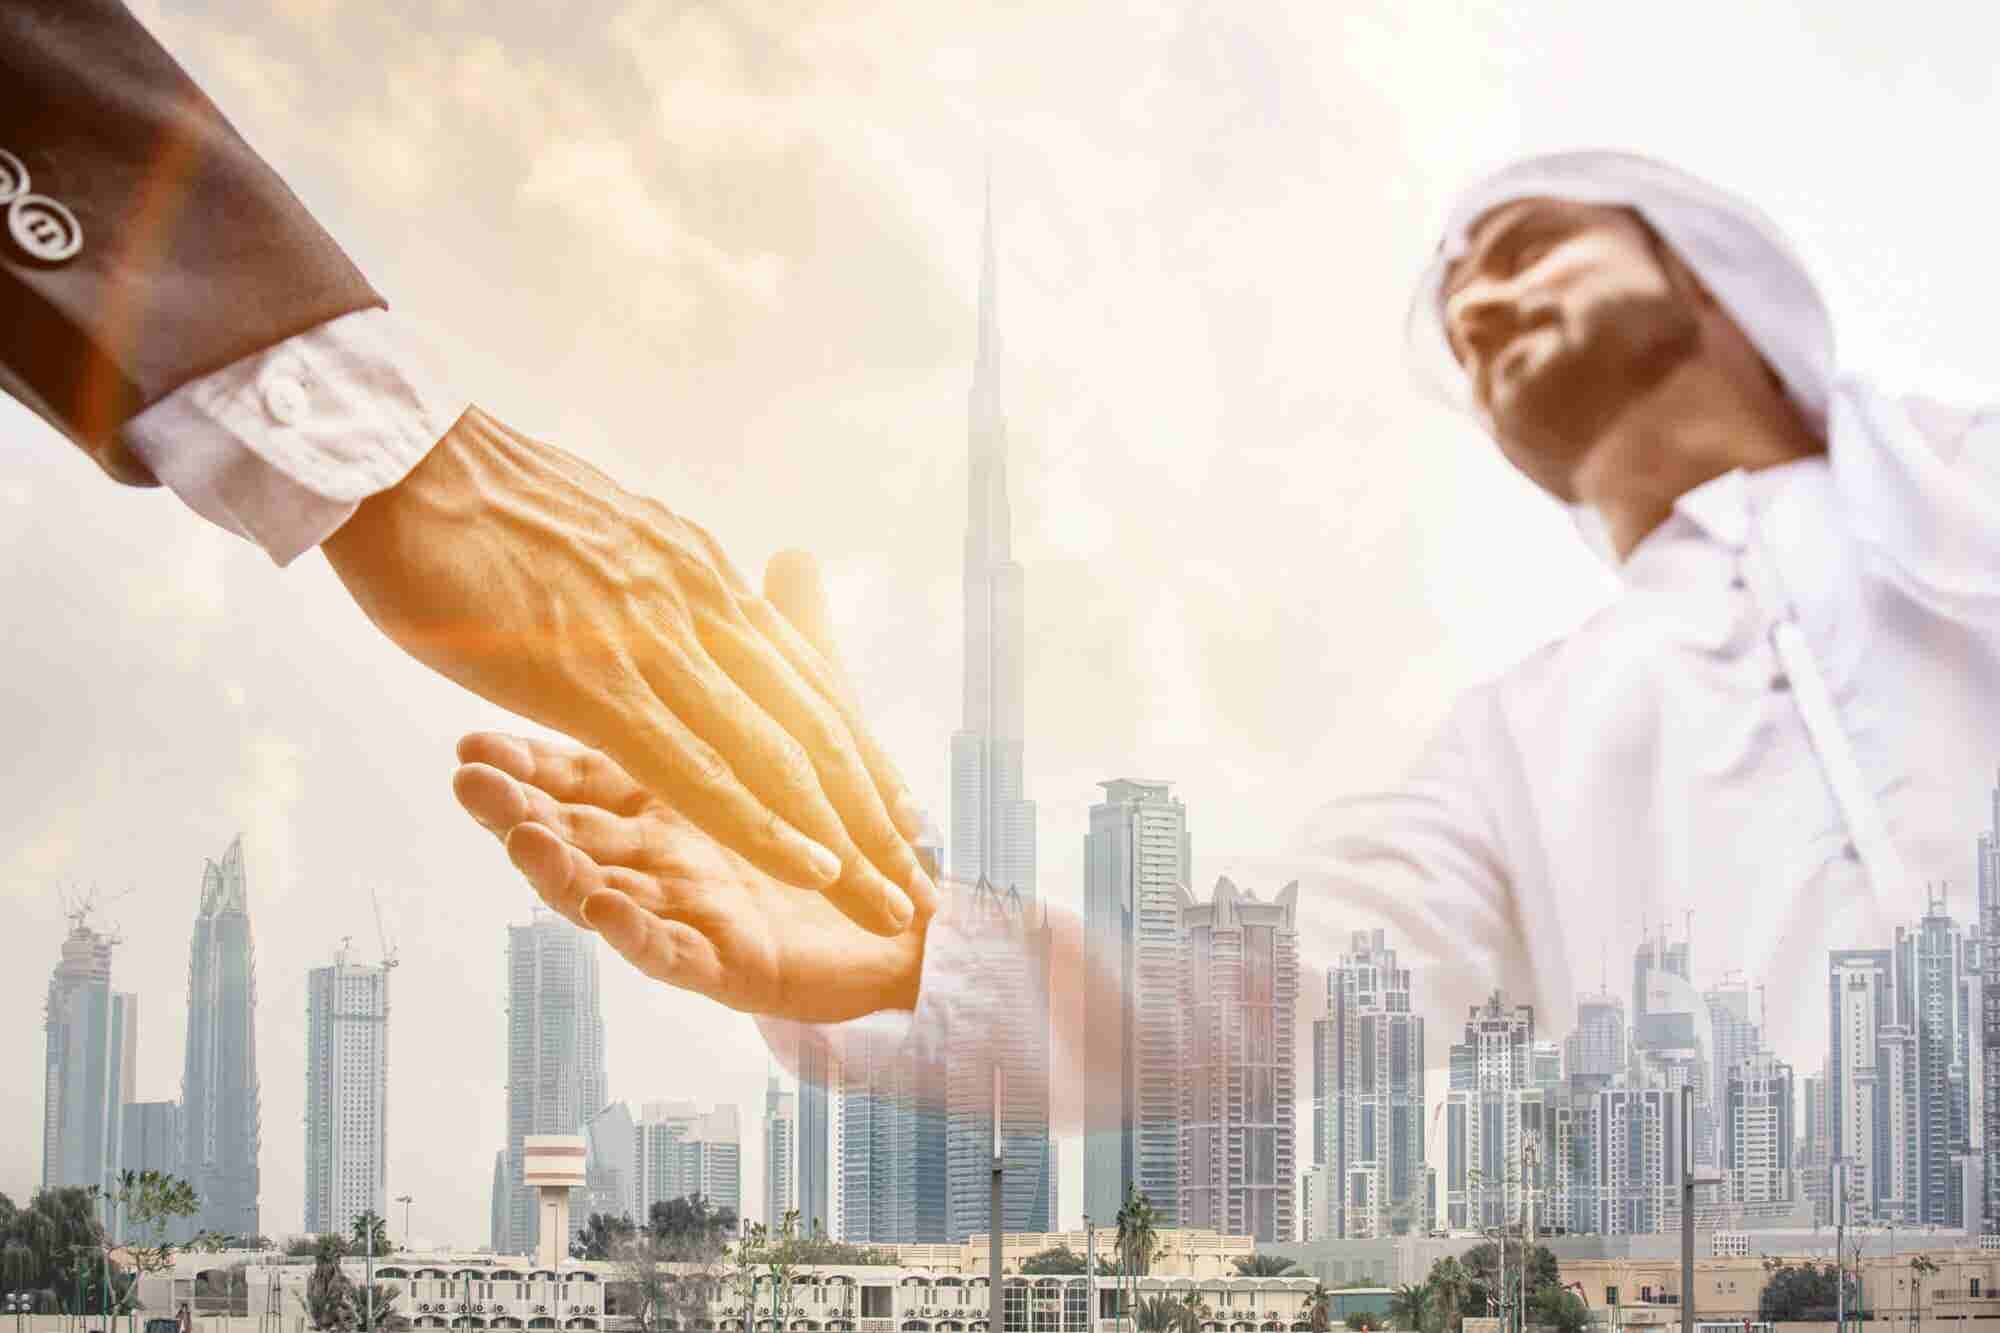 Matchmaking For Entrepreneurs: Dubai Startup Hub Launches Co-Founder D...